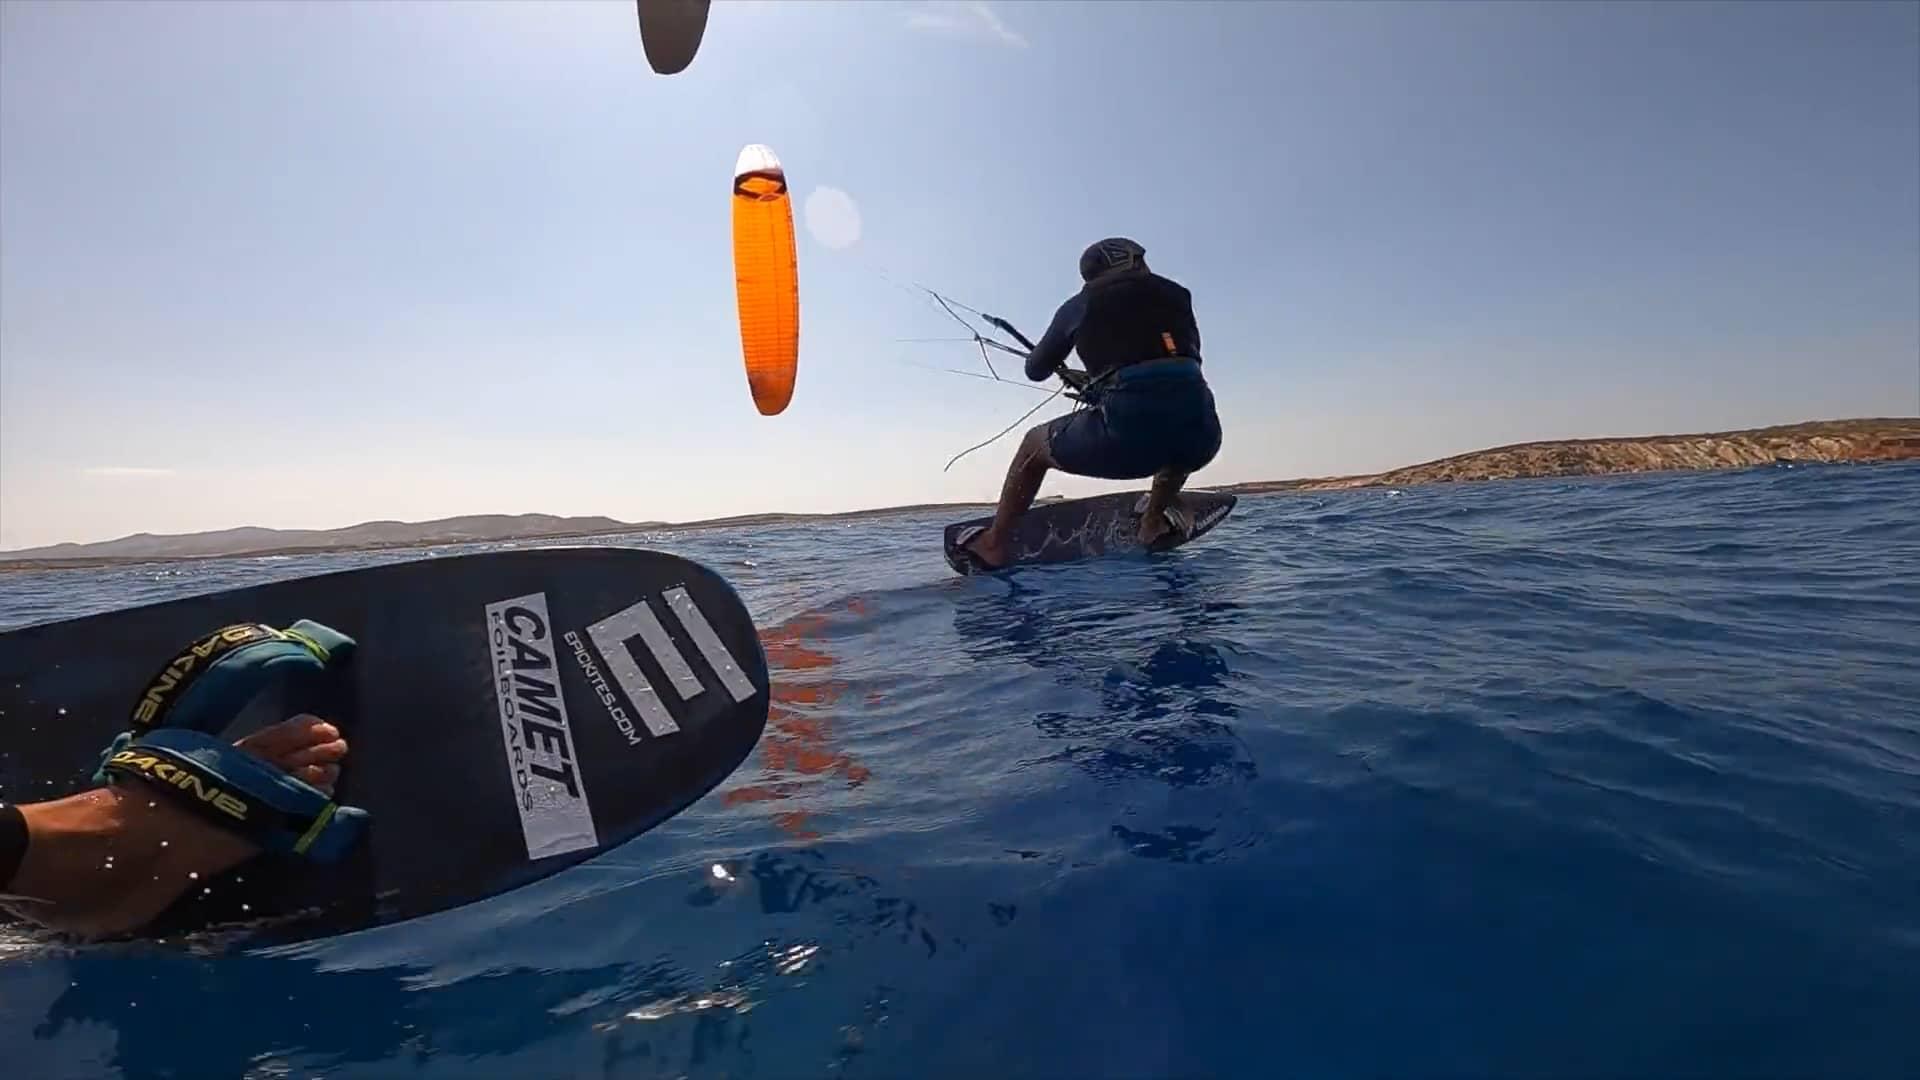 KiteFoil racing on the island of Paros - with Epic Kites Kiteboarding